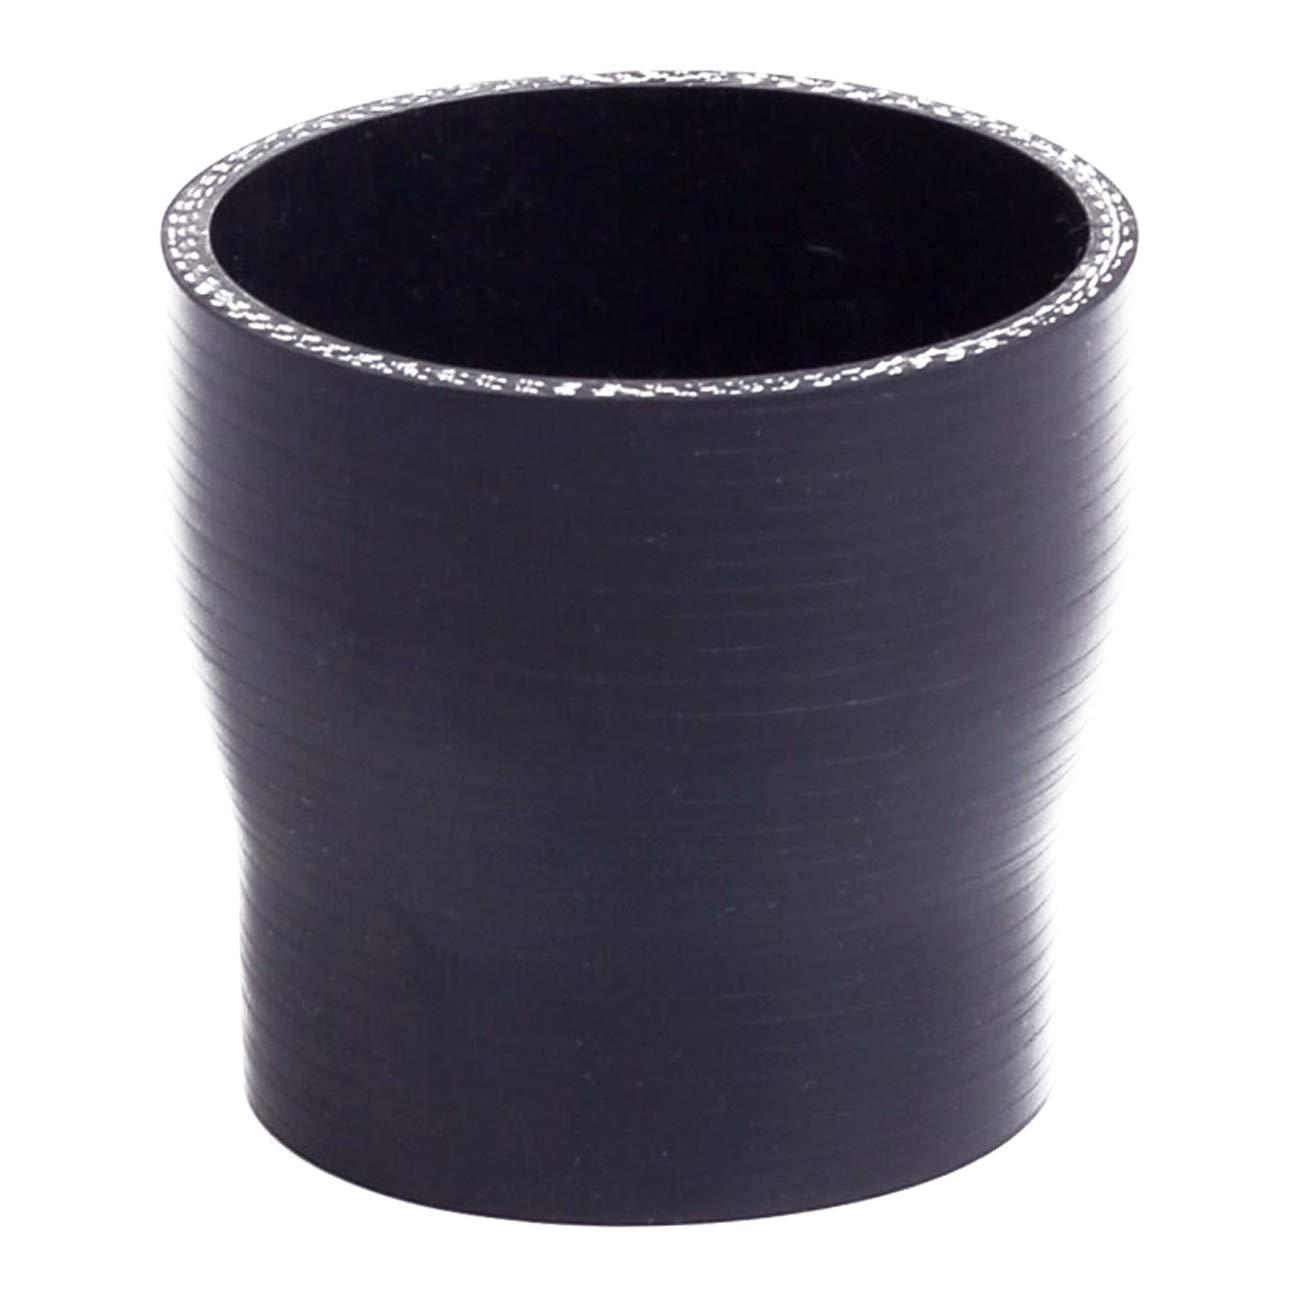 ZaZaTool 3 to 3.75 76-95 mm Straight Silicone Hose Reducer Turbo Coupler Black